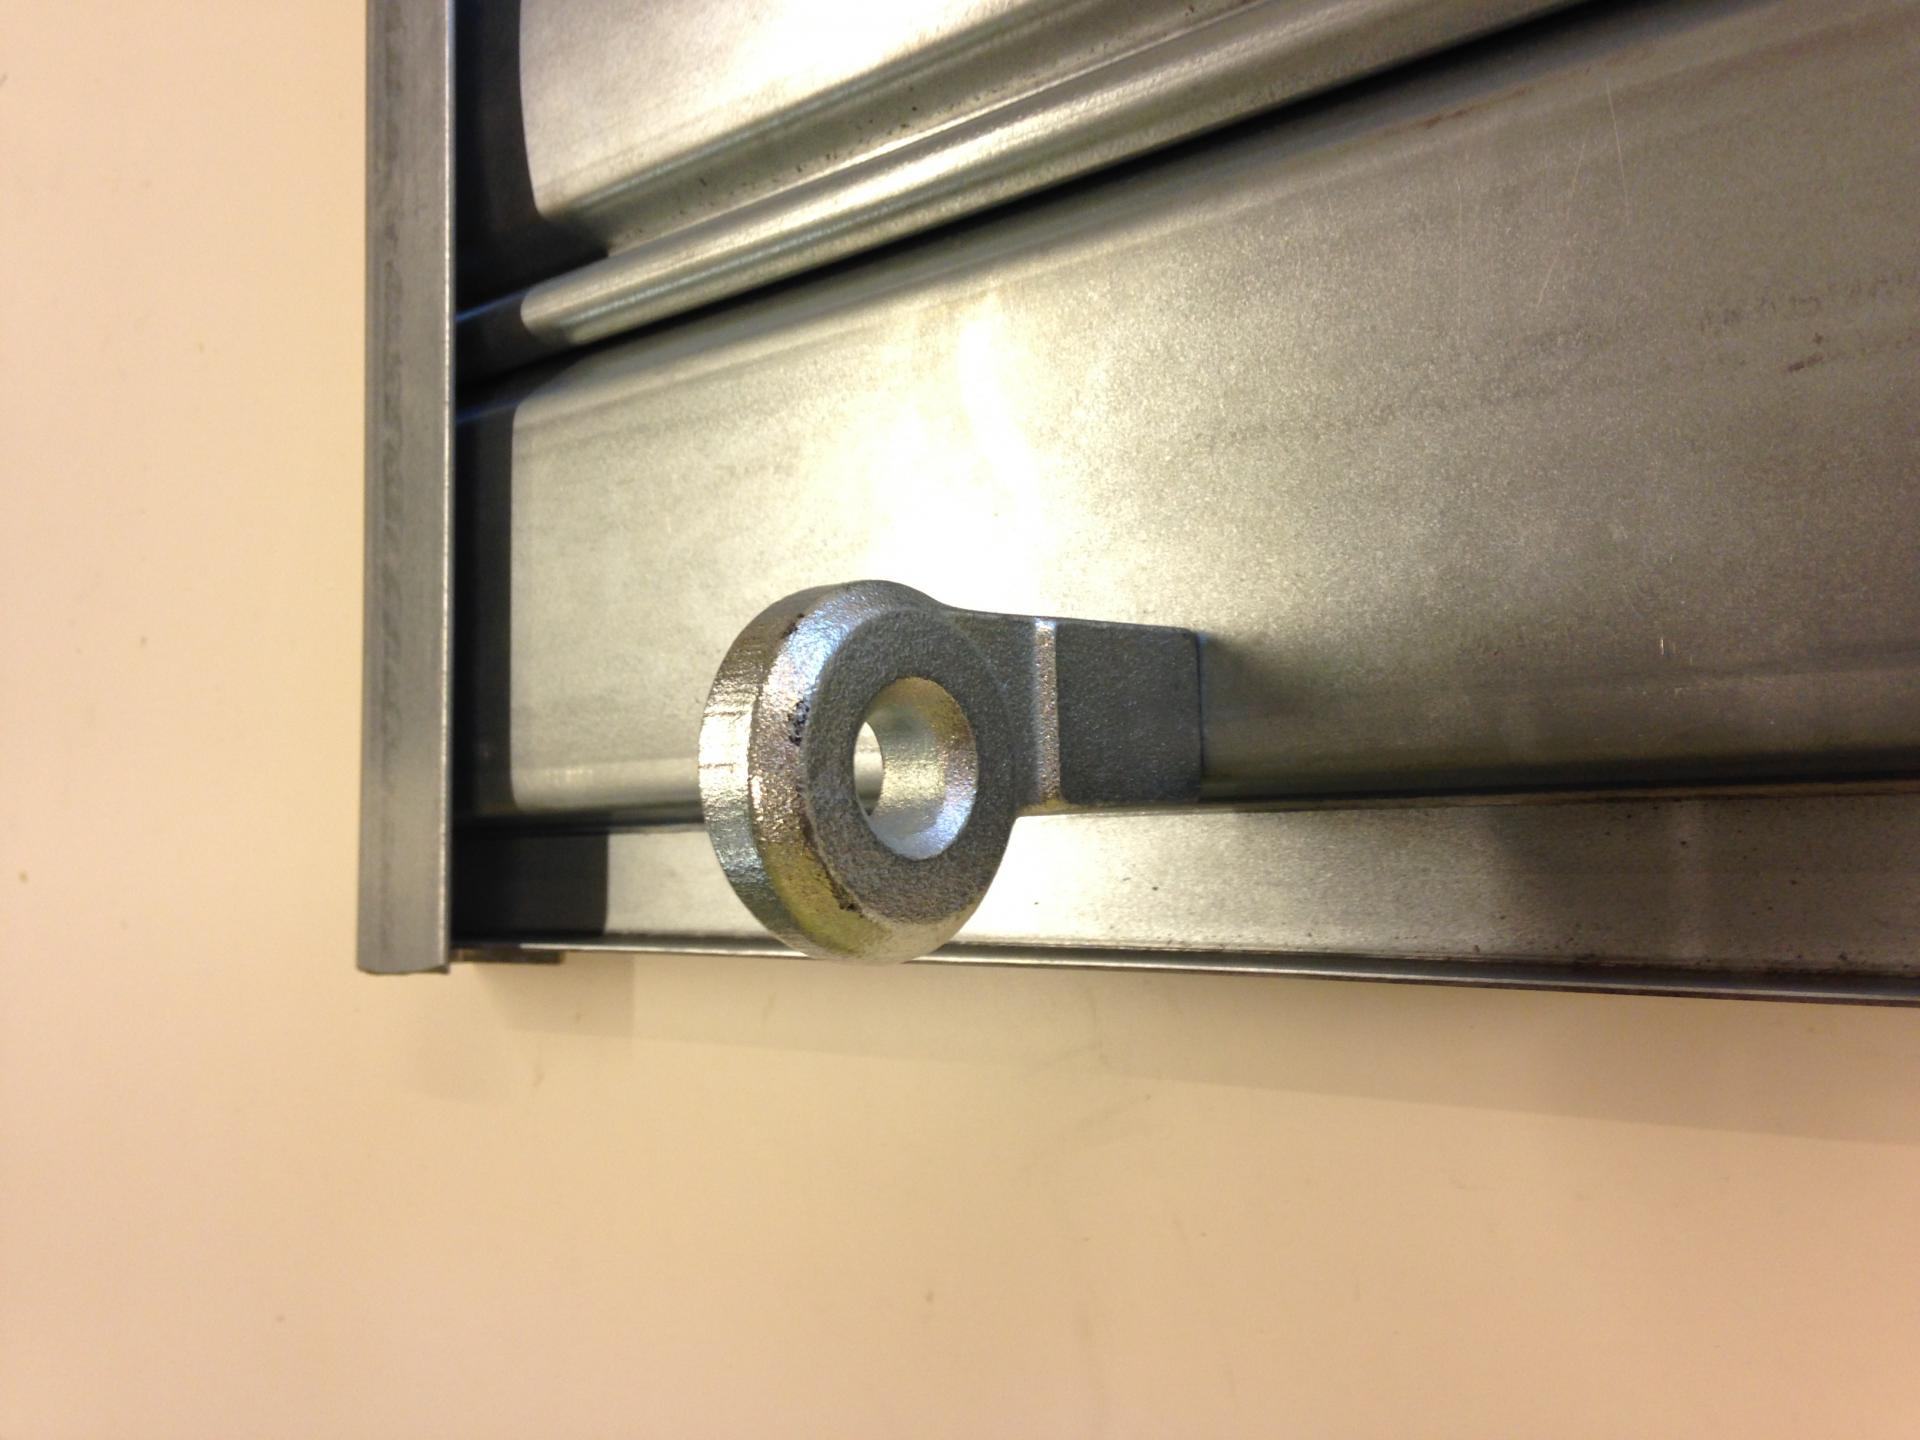 Porte cadenas viro 695 pour rideaux metalliques 1